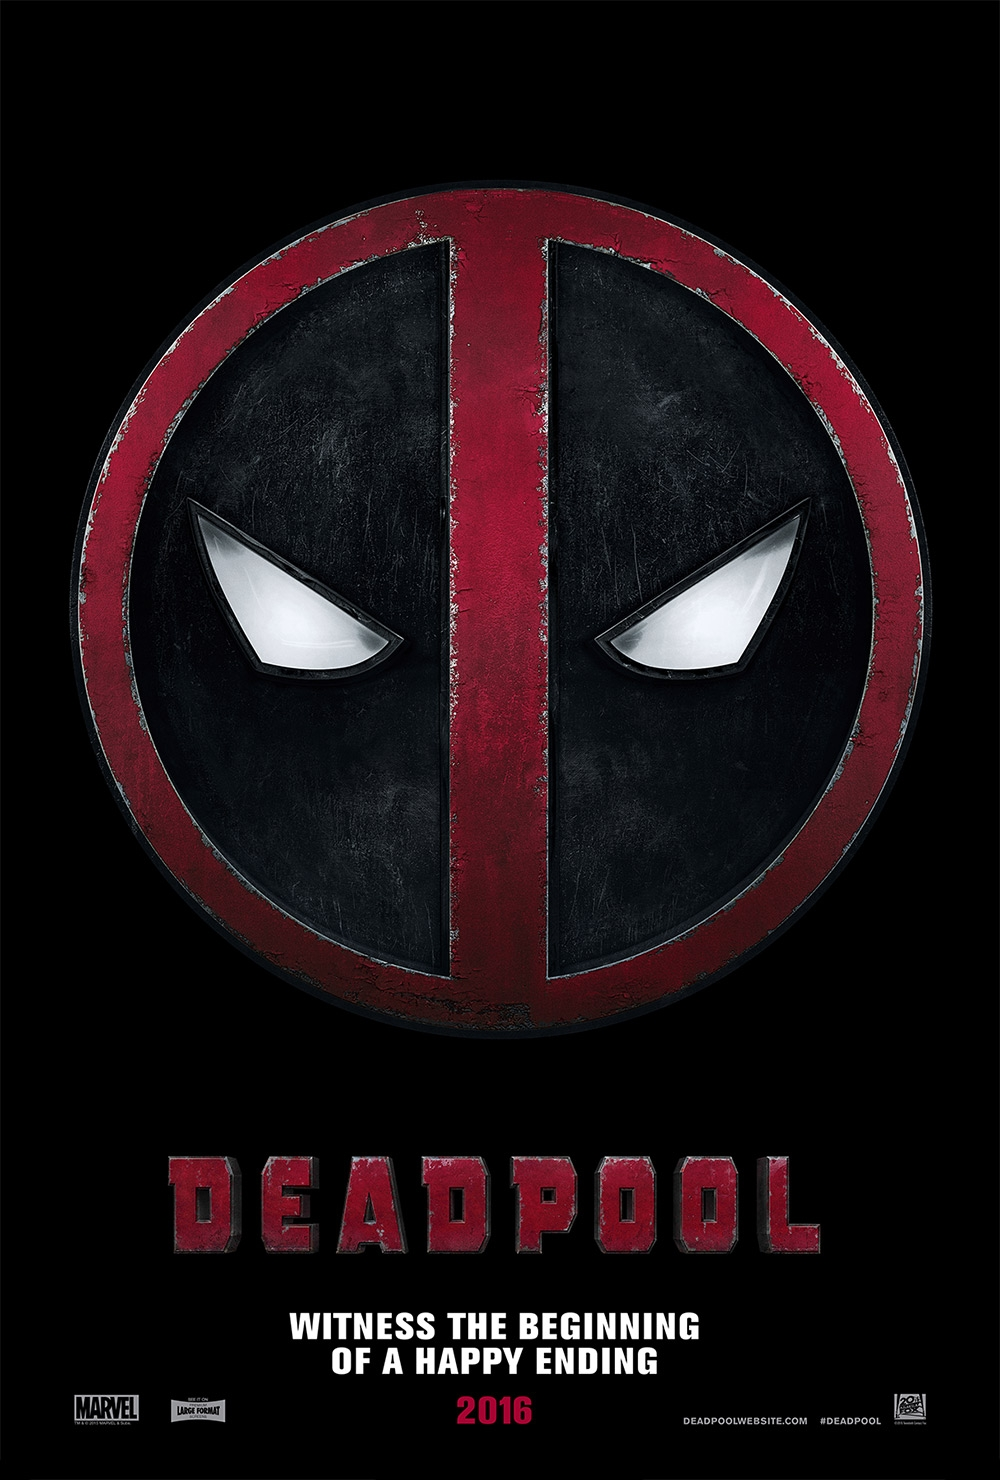 deadpool1-gallery-image